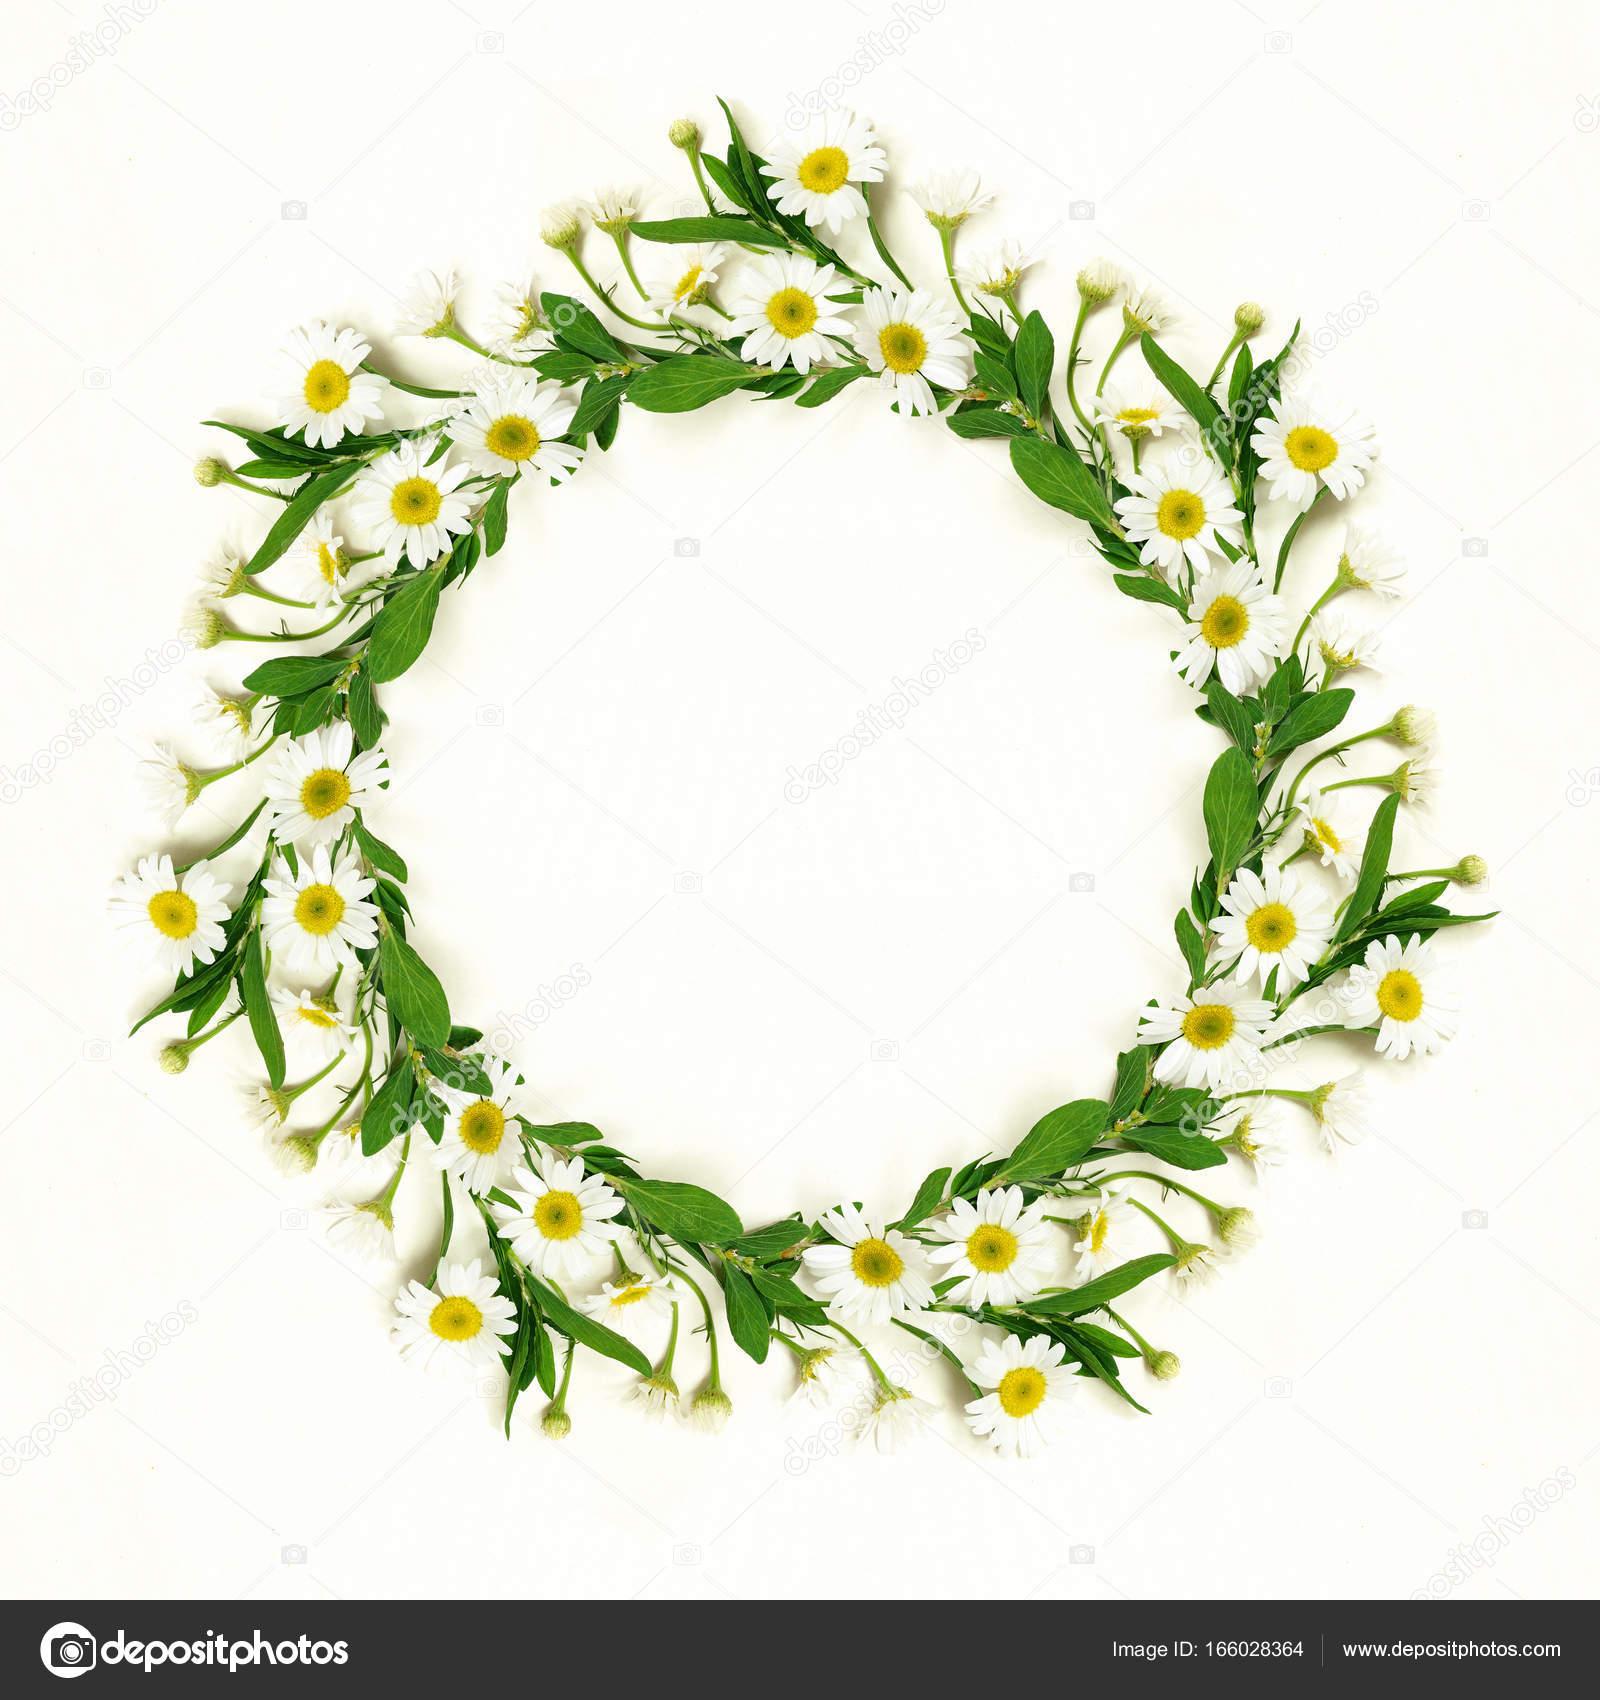 Flores de Margarita redondo marco — Foto de stock © ksushsh #166028364